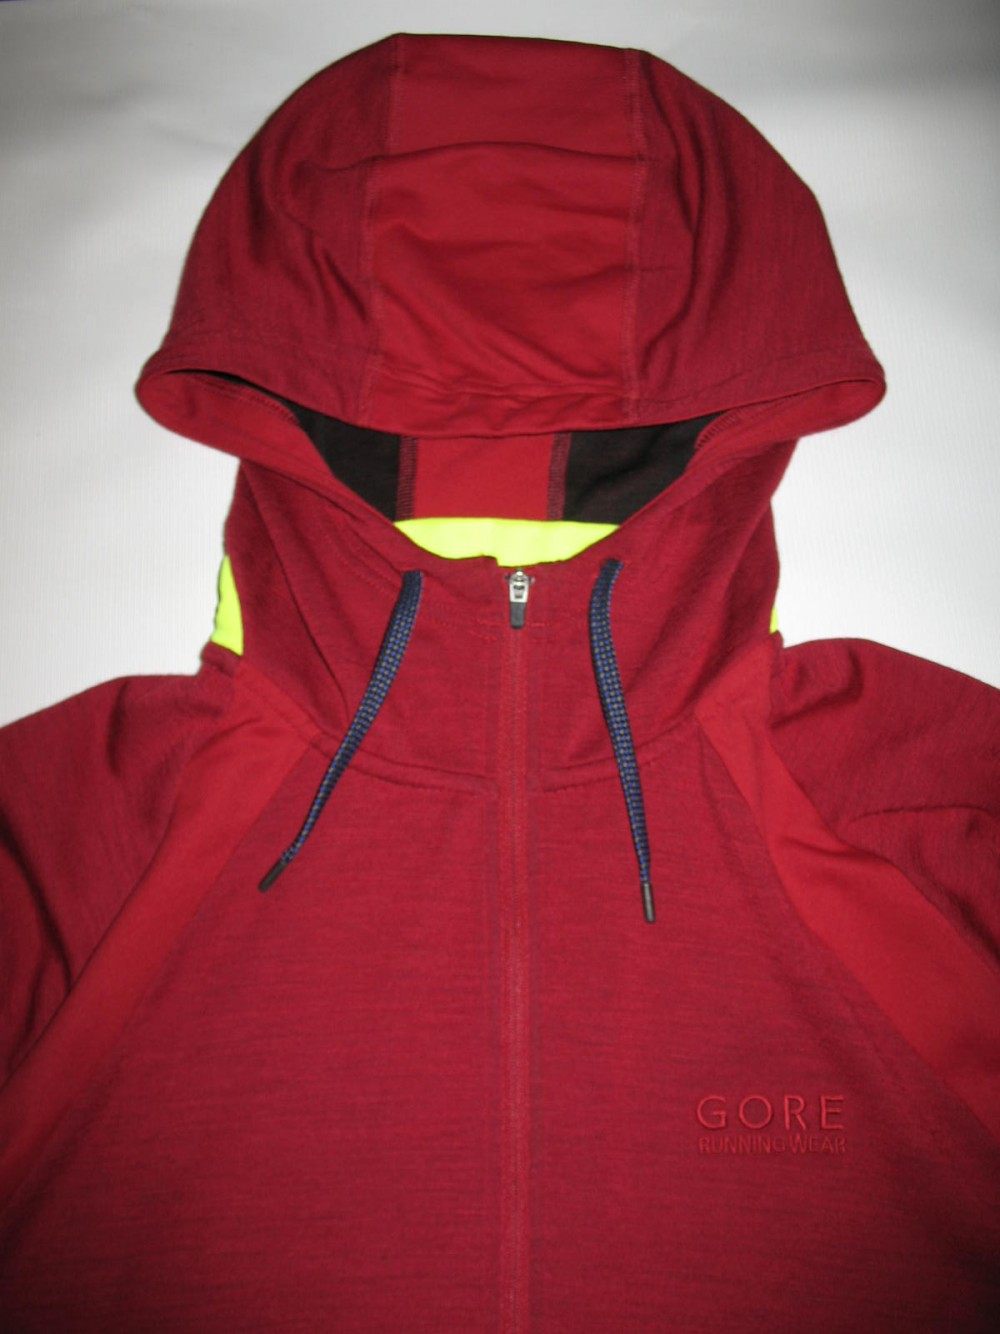 Кофта GORE running wear hooded running jacket (размер XXL) - 8